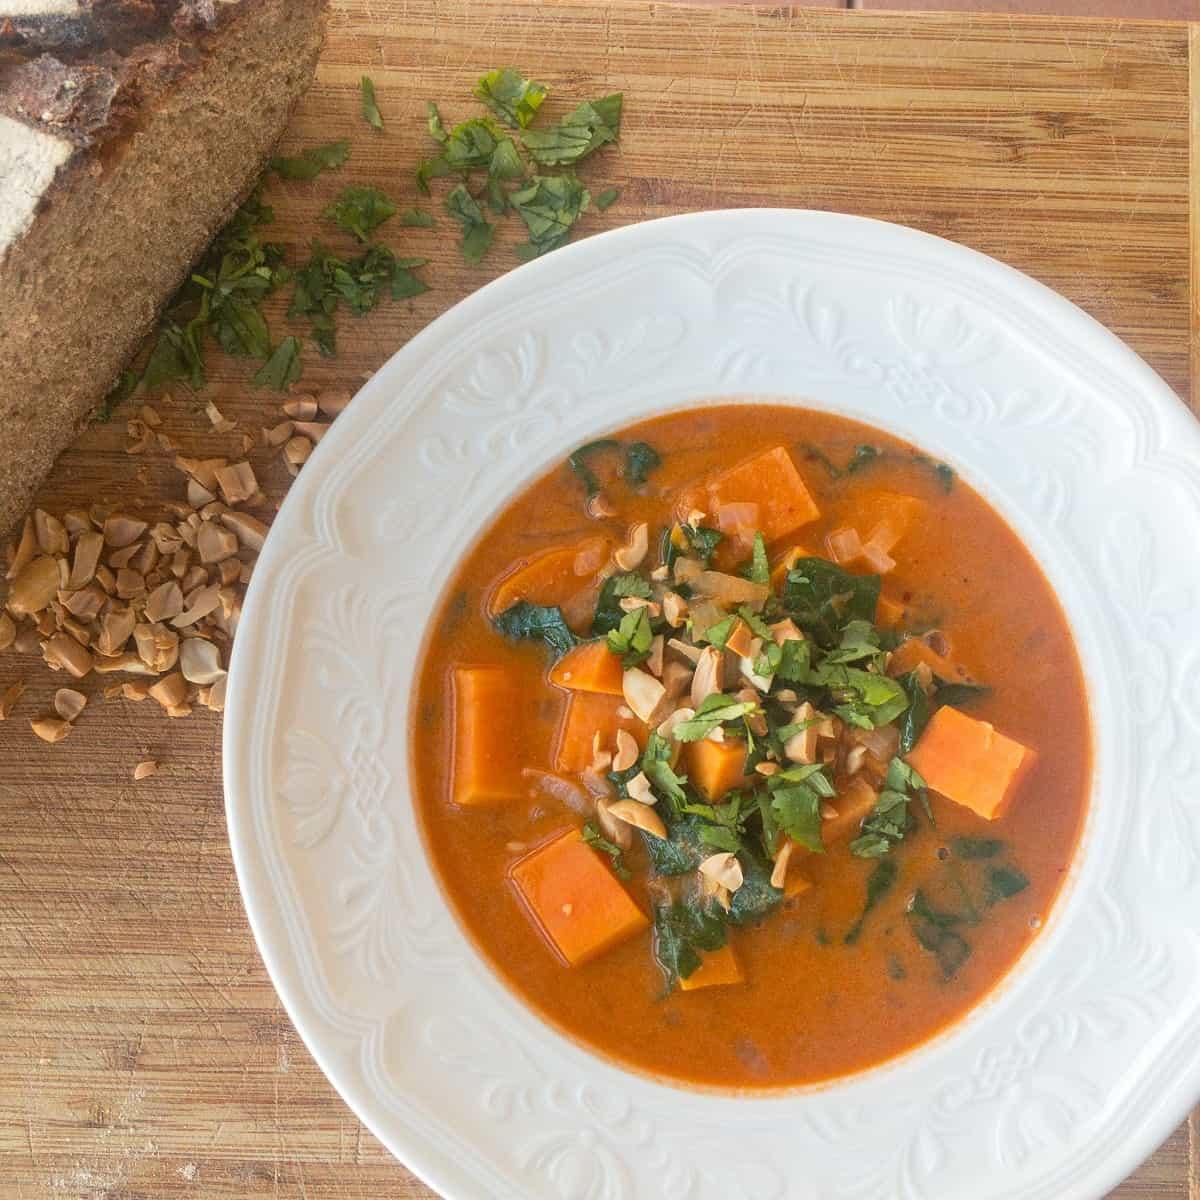 peanut soup on plate